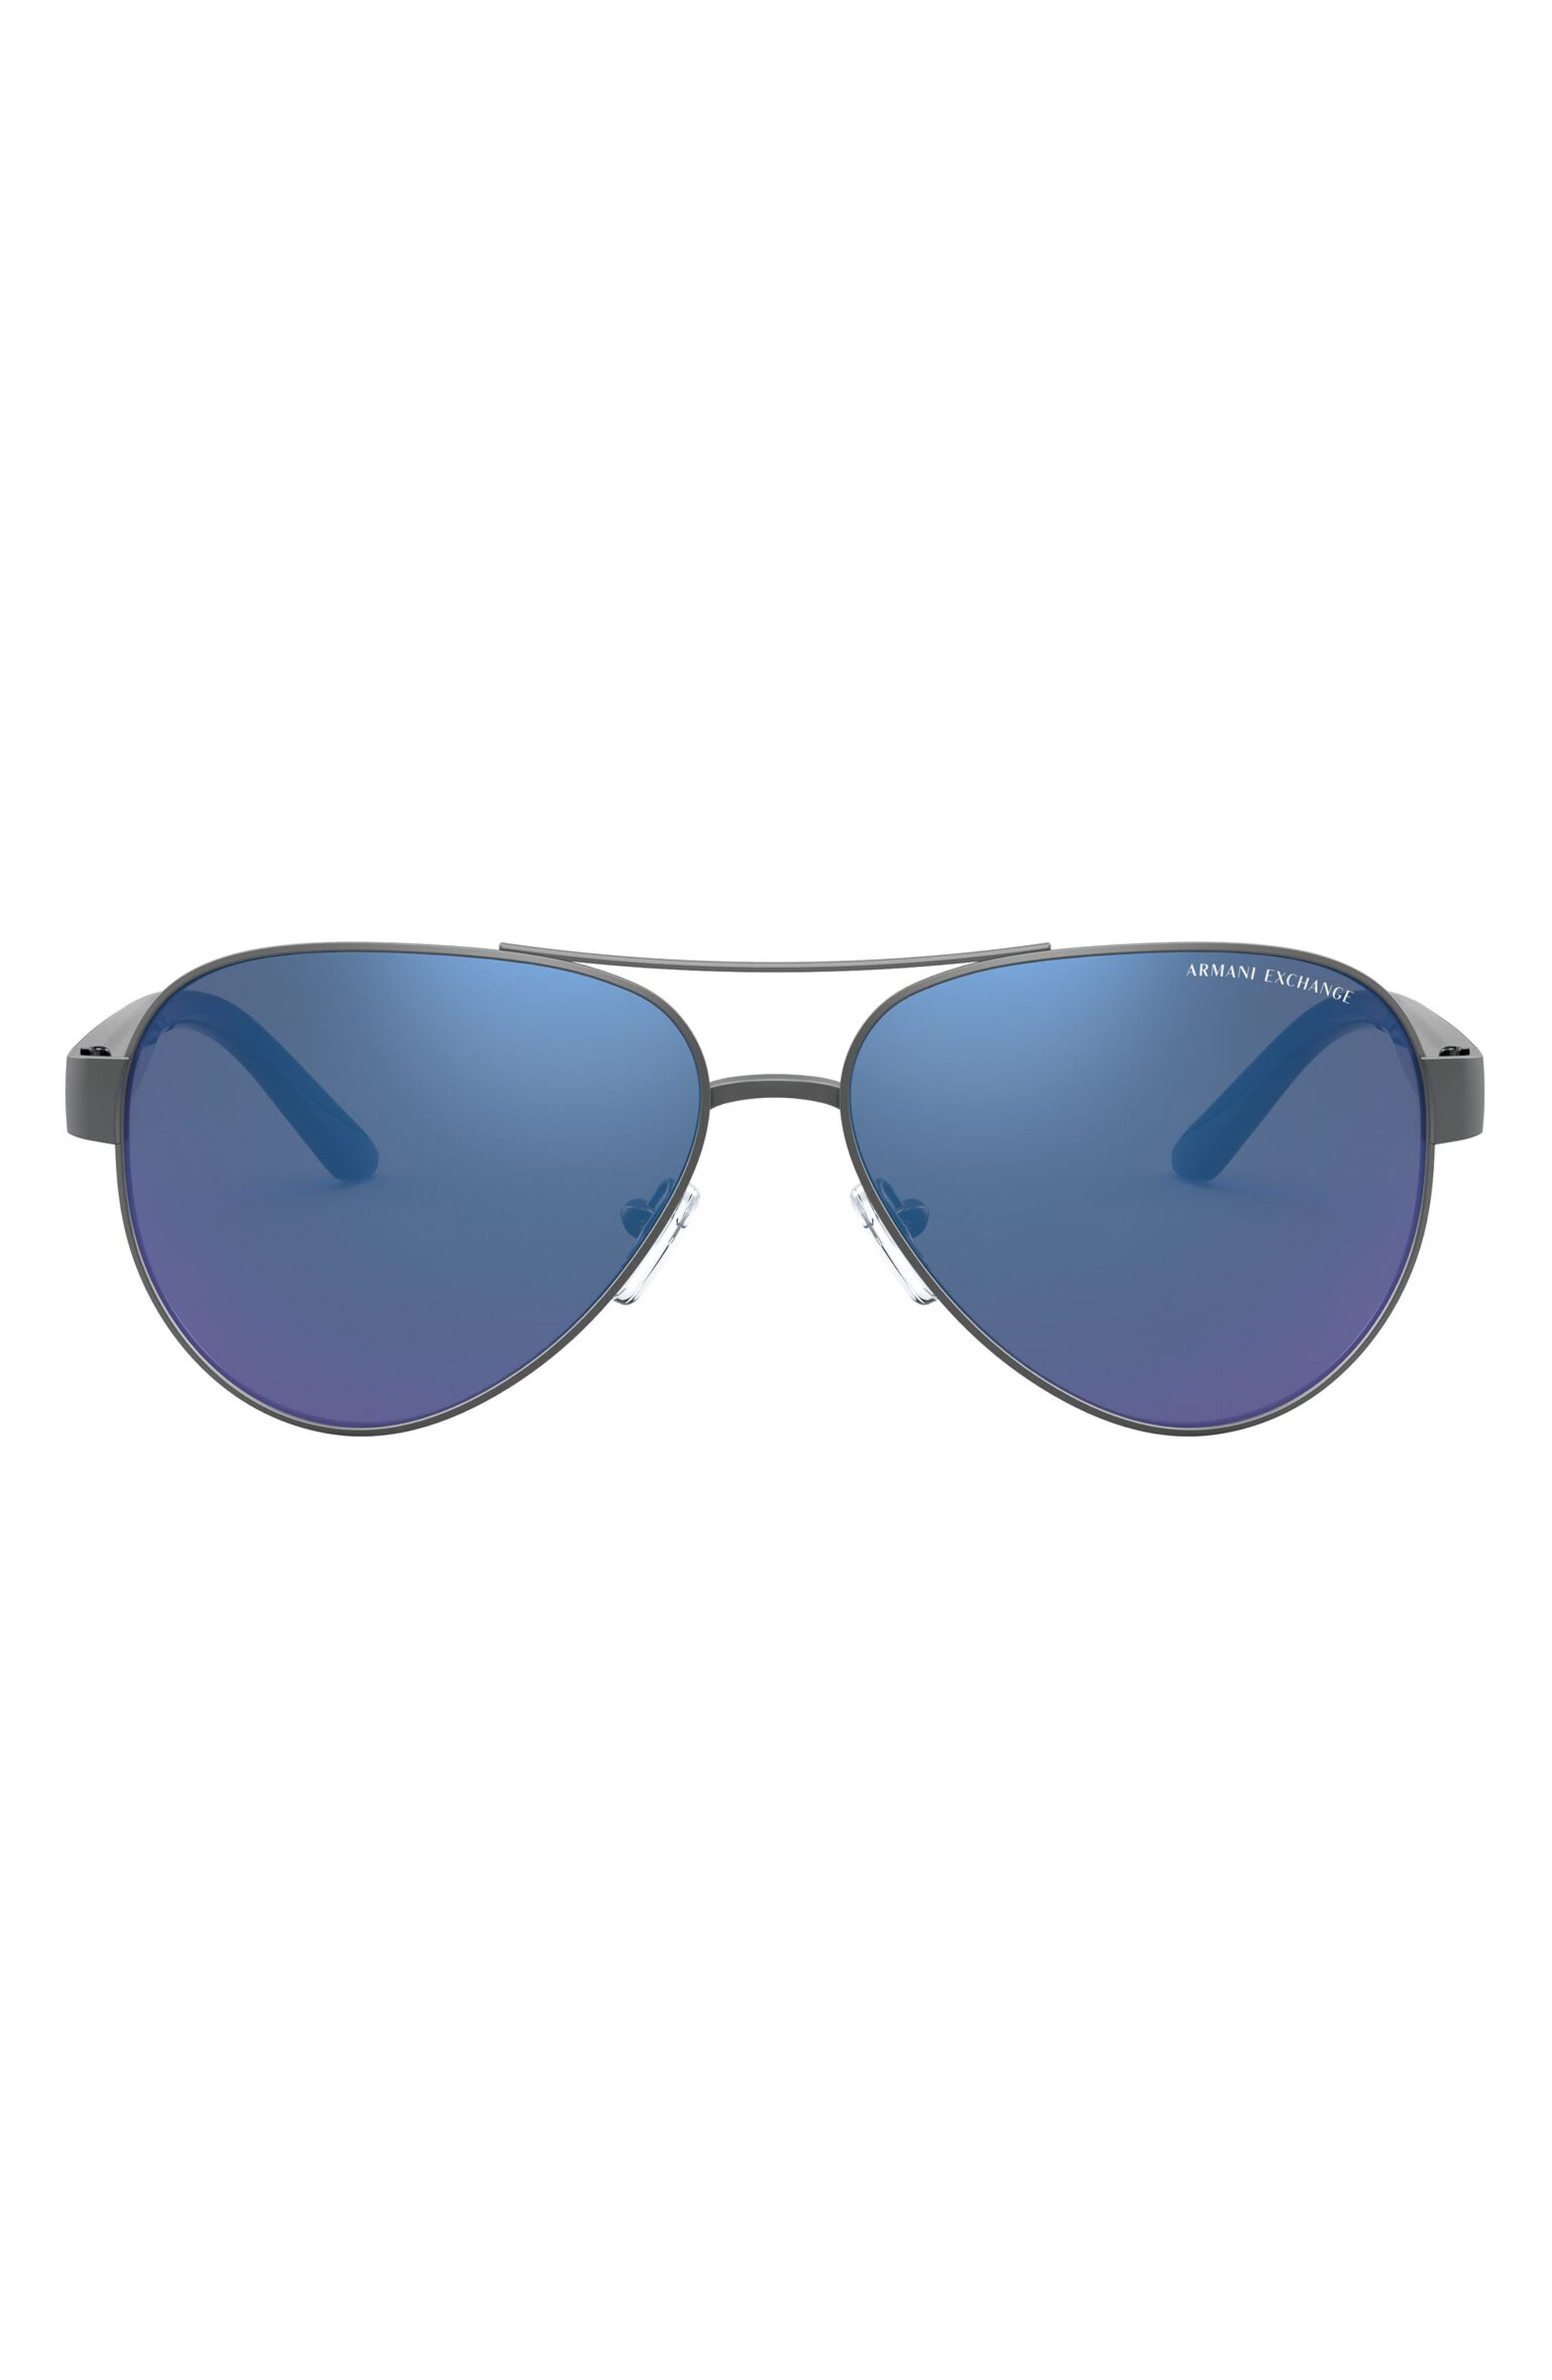 34mm Aviator Sunglasses